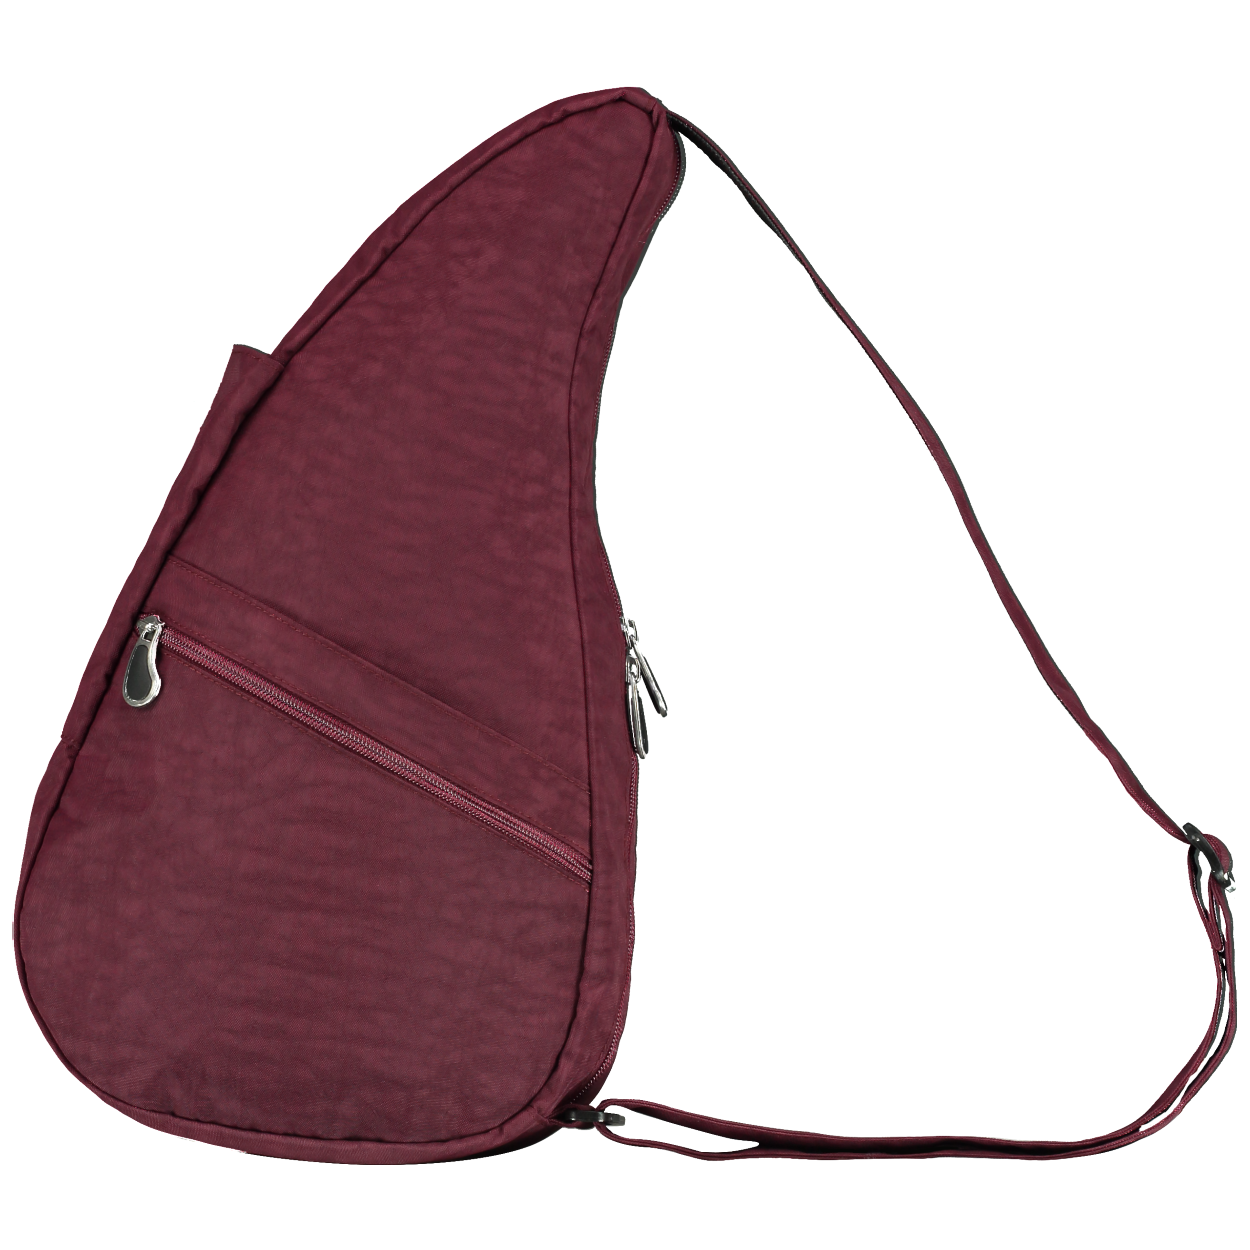 Healthy Back Bag 6303 Textured Nylon Fig S